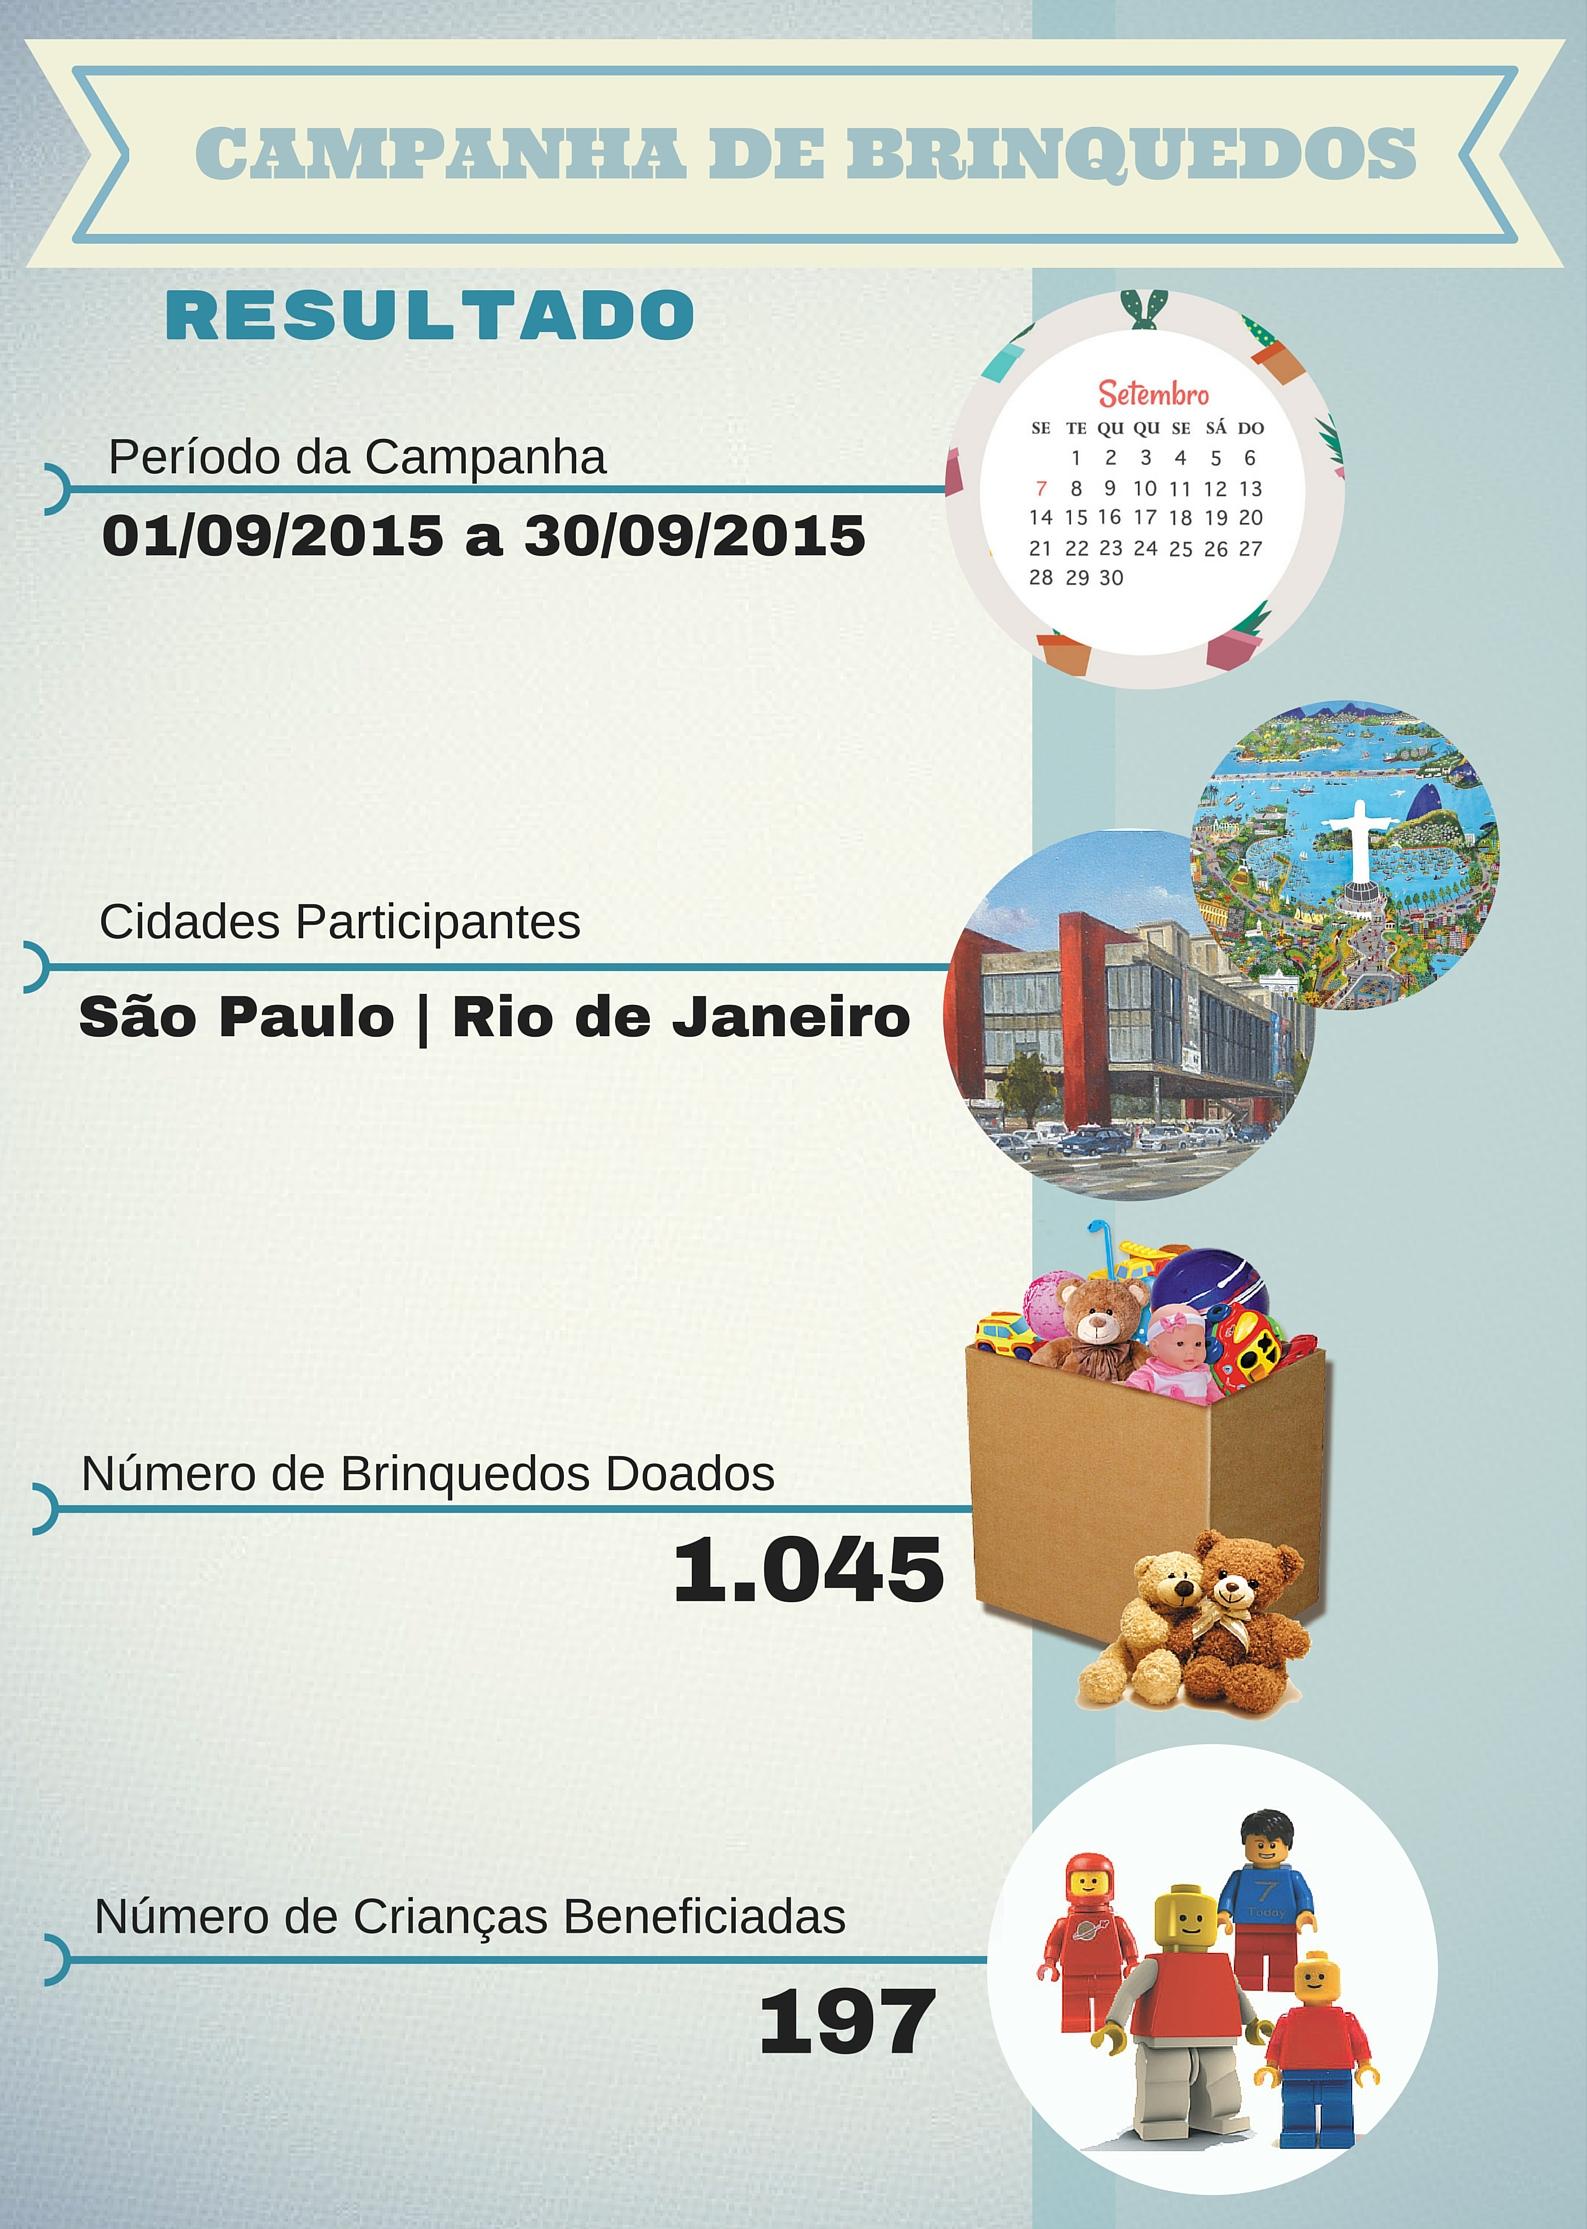 CAMPANHA DE BRINQUEDOS